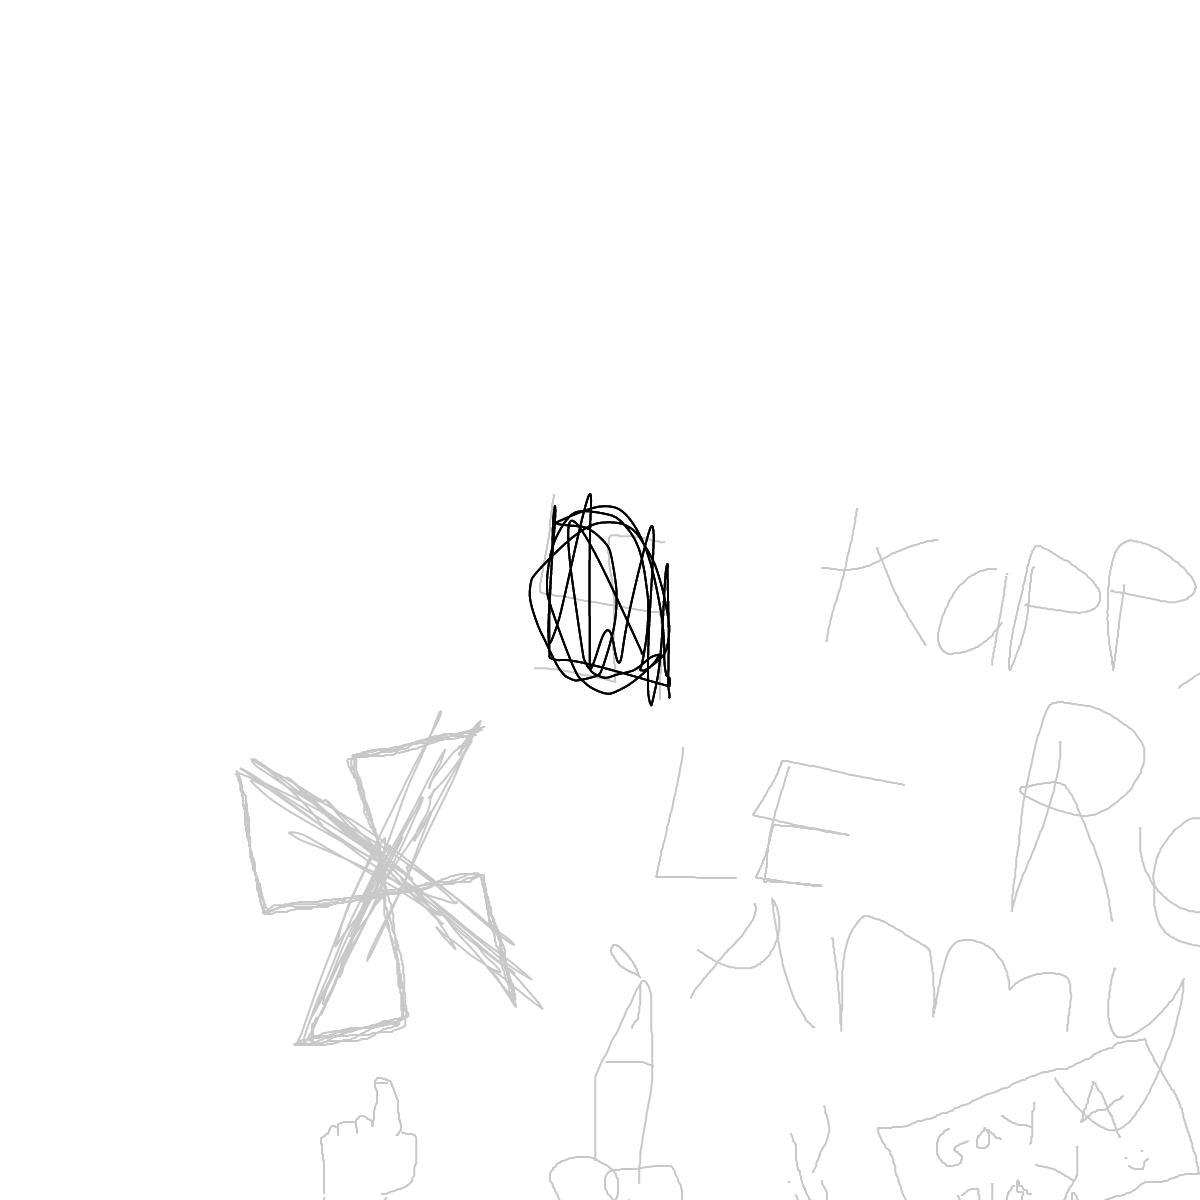 BAAAM drawing#2661 lat:-45.0425643920898440lng: 169.1999359130859400